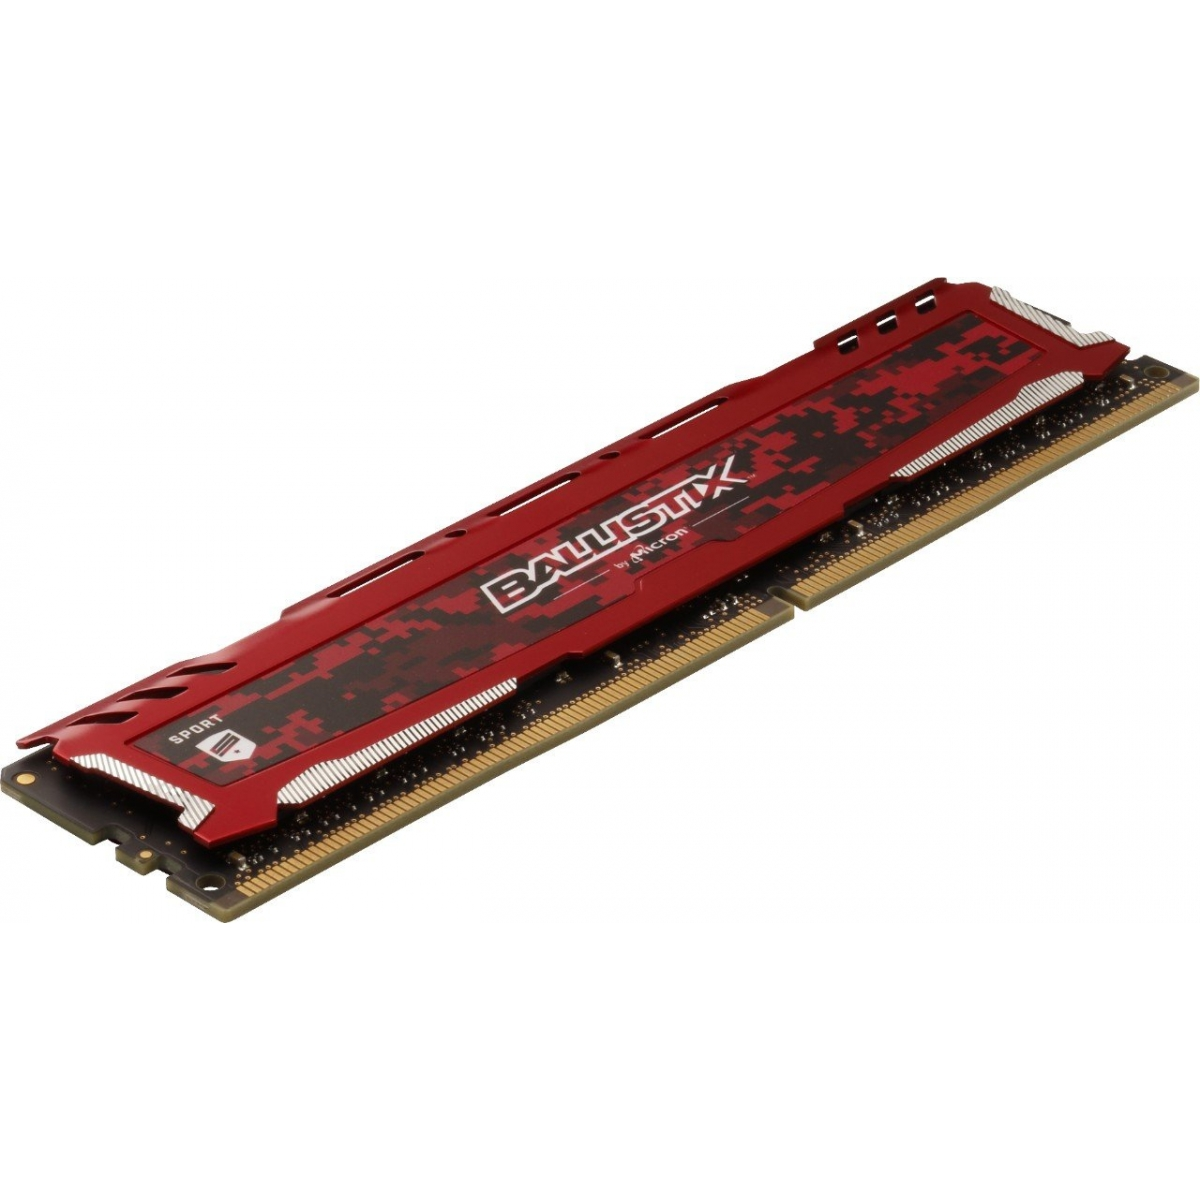 Memória DDR4 Crucial Ballistix Sport Lt, 8GB 3200MHz, Red, BLS8G4D32AESEK